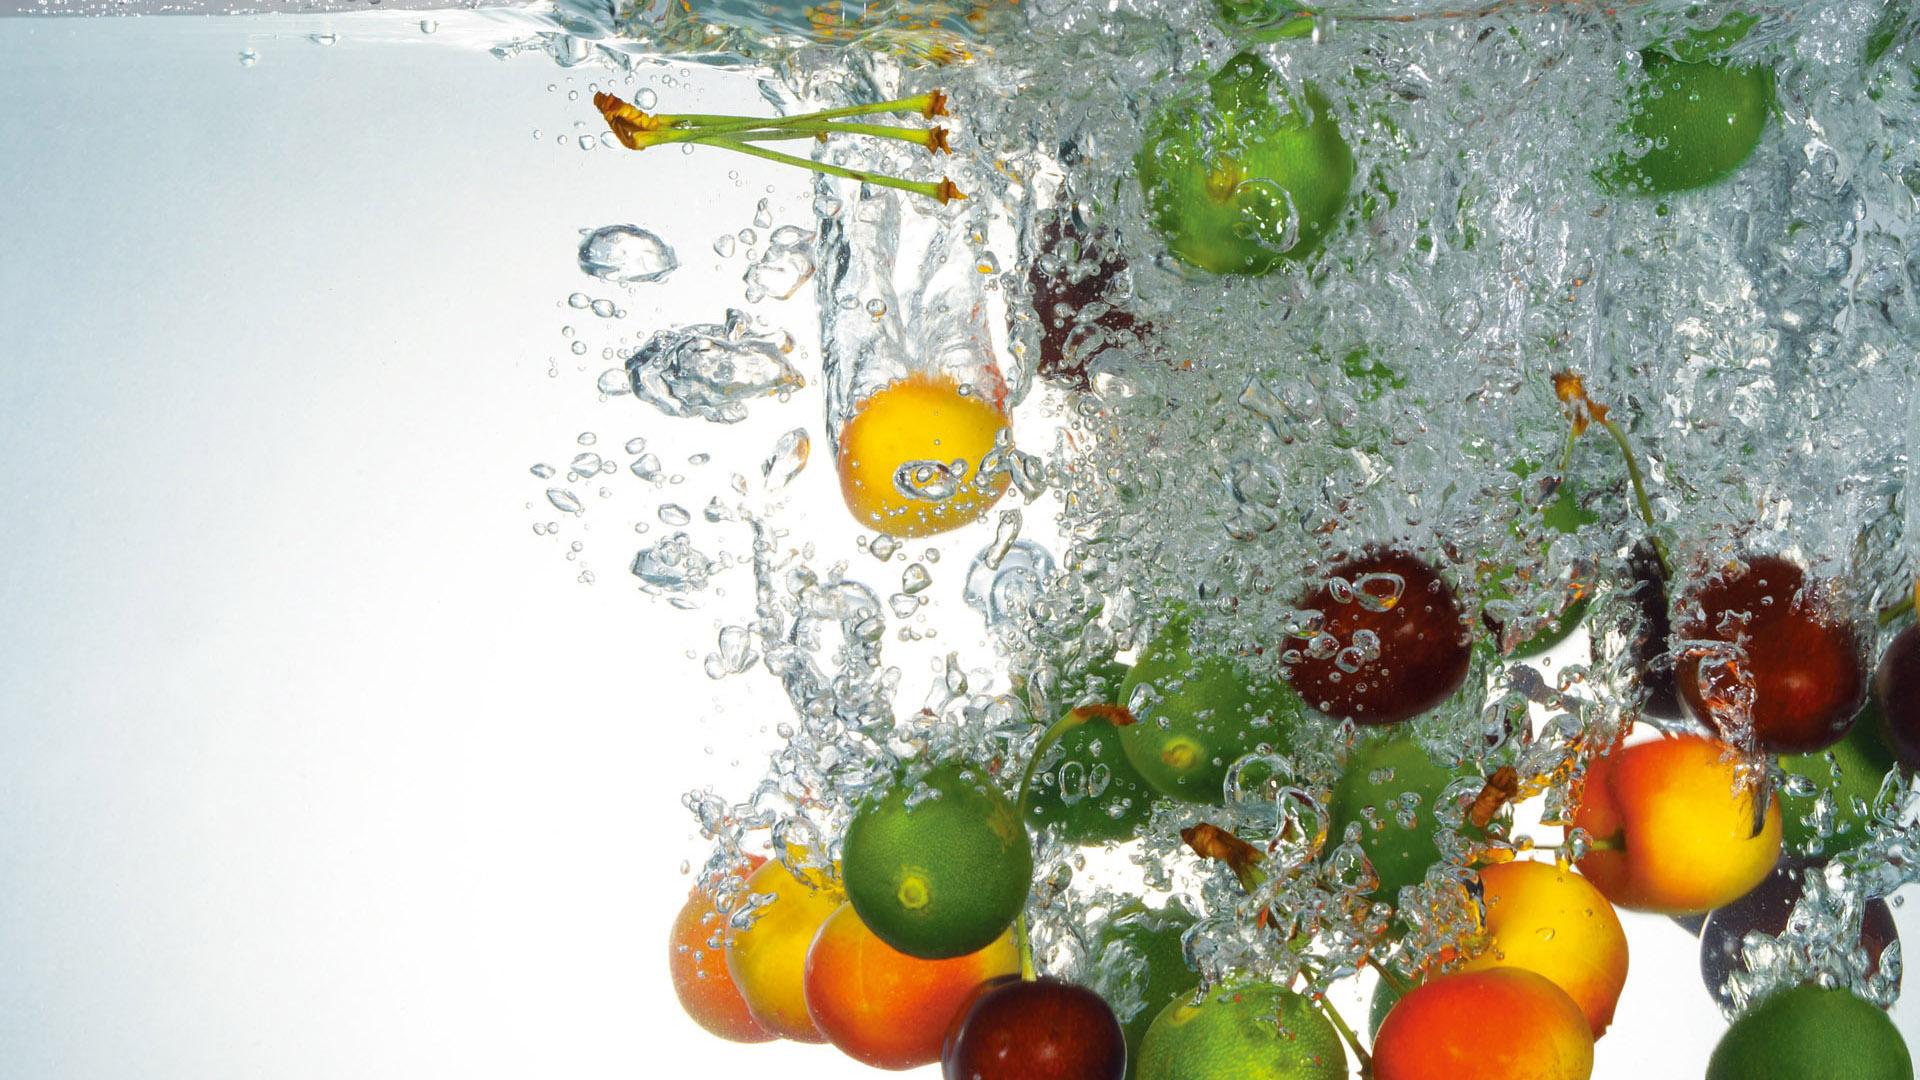 обои вода, капли, пузырьки, фрукты картинки фото